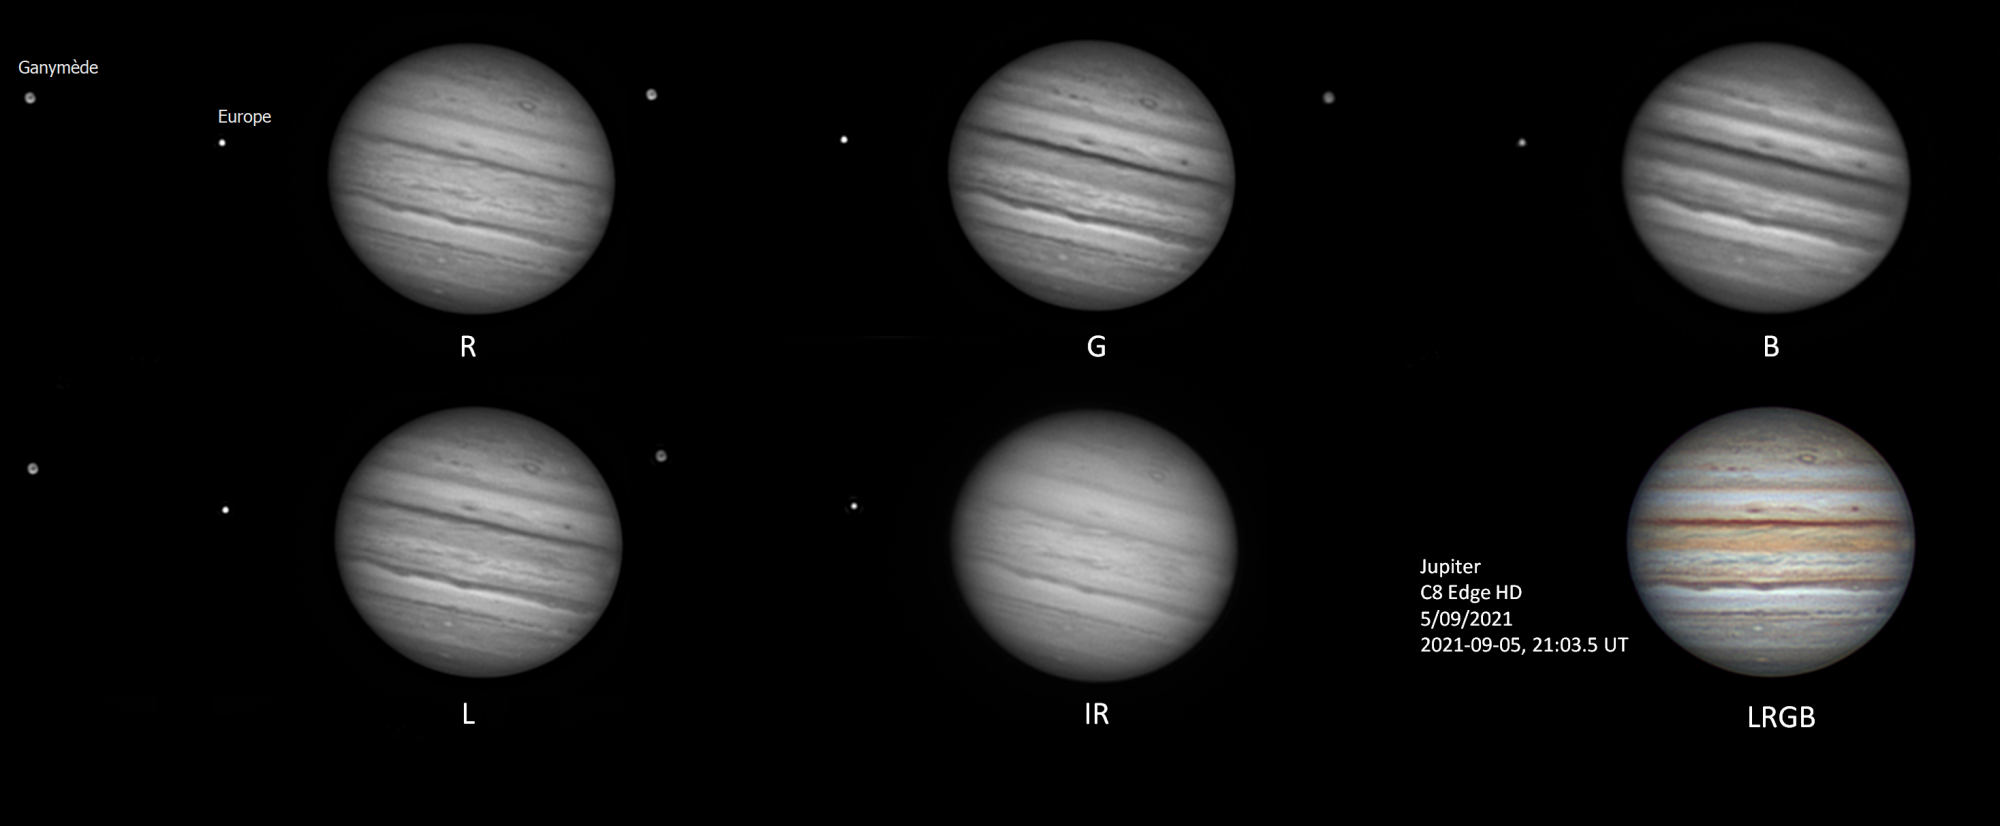 Jupiter_05092021.thumb.png.b3e377054bb8fb44f0e015d552a7ad75.png